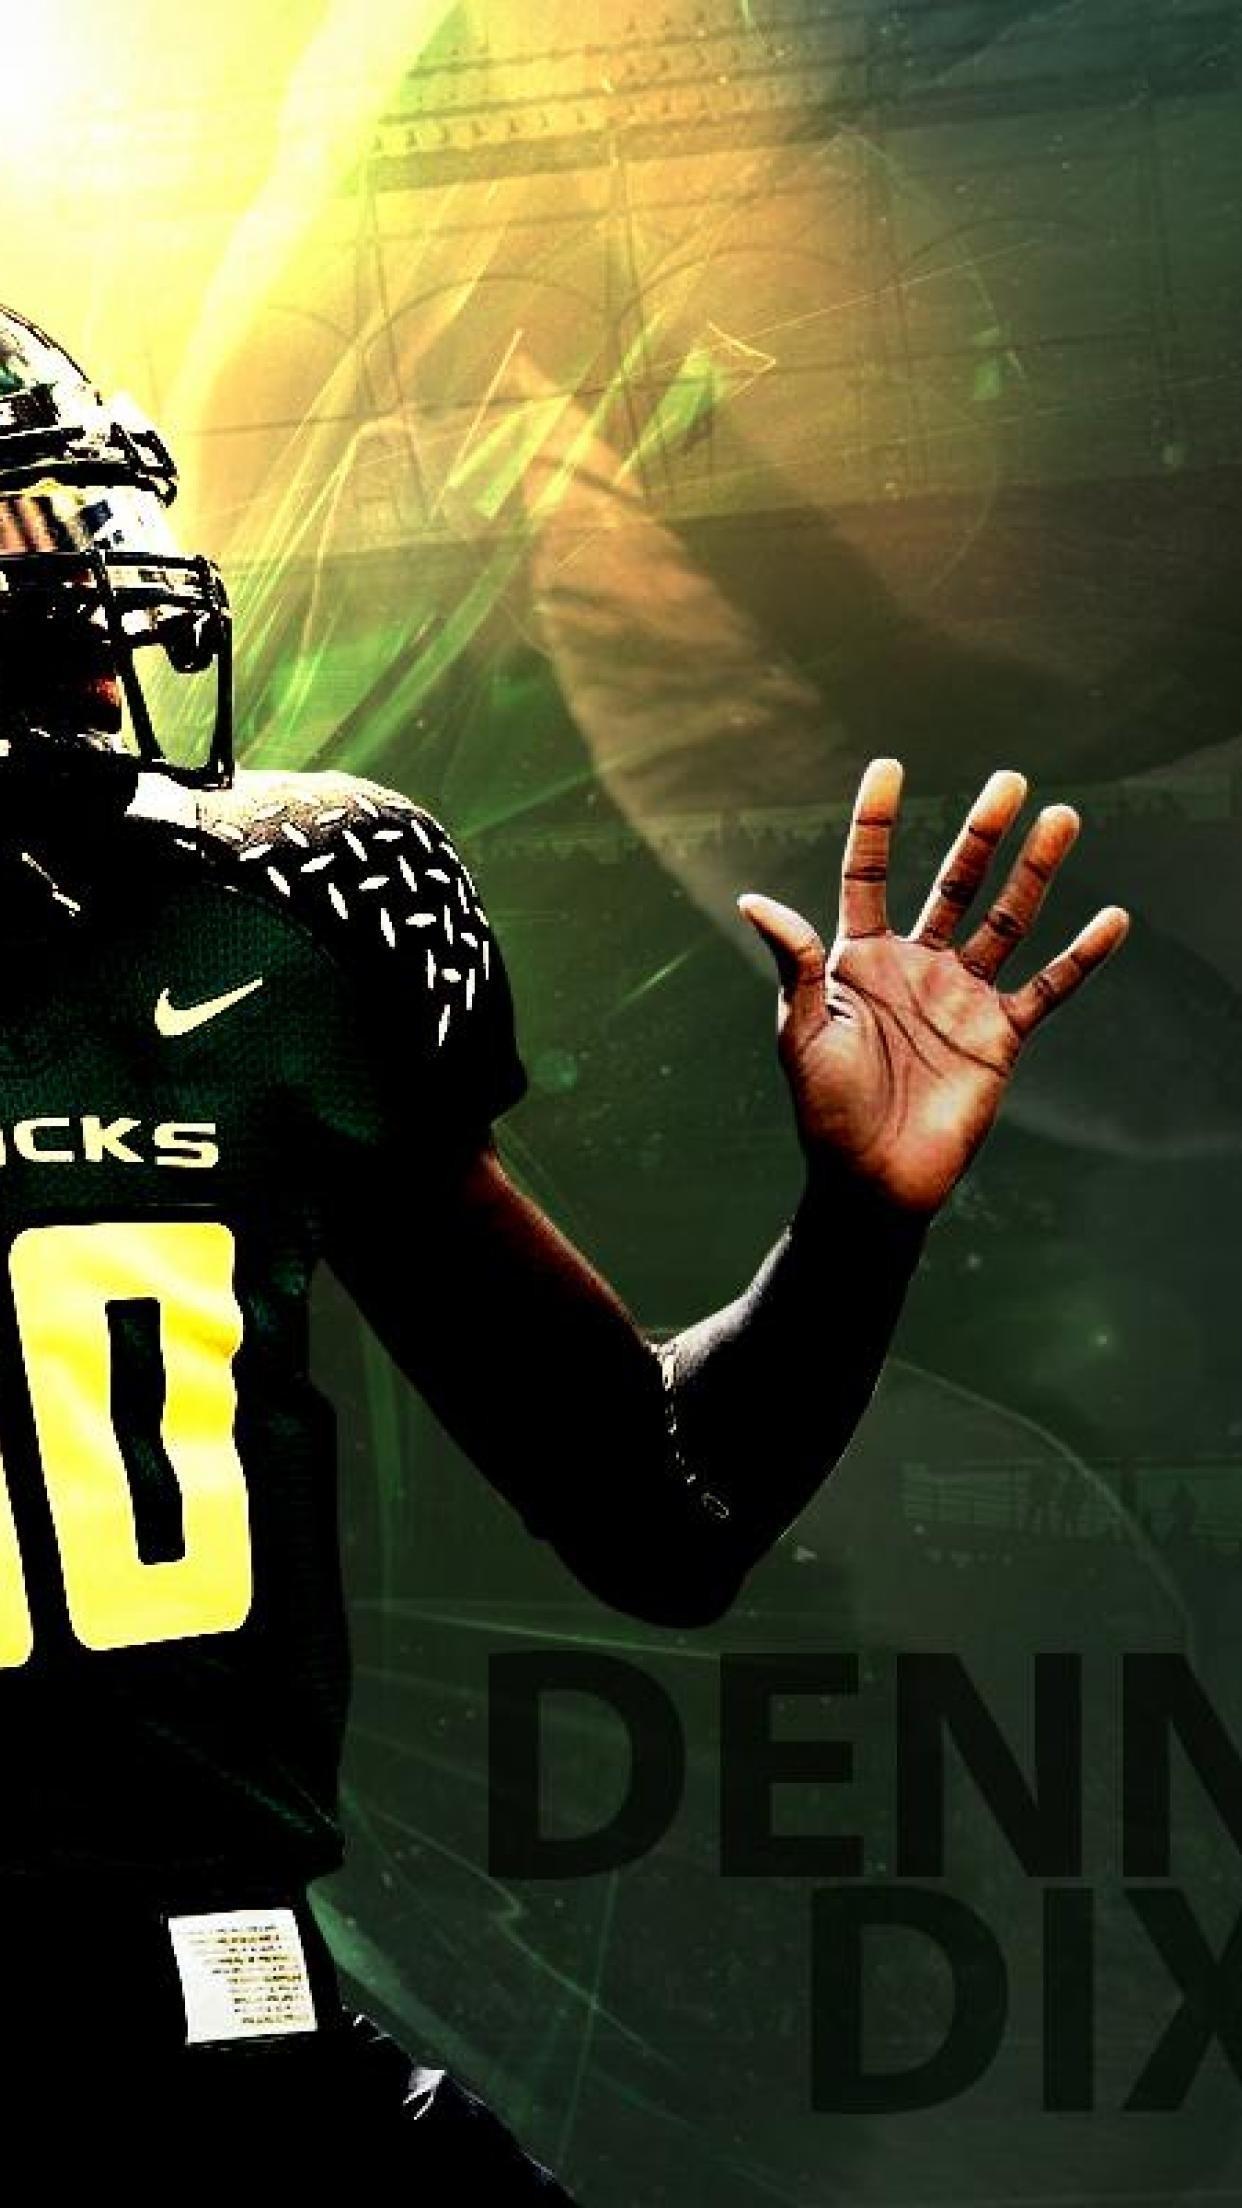 2048x1364 Hd Oregon Ducks Stadium Wallpaper Desktop Background